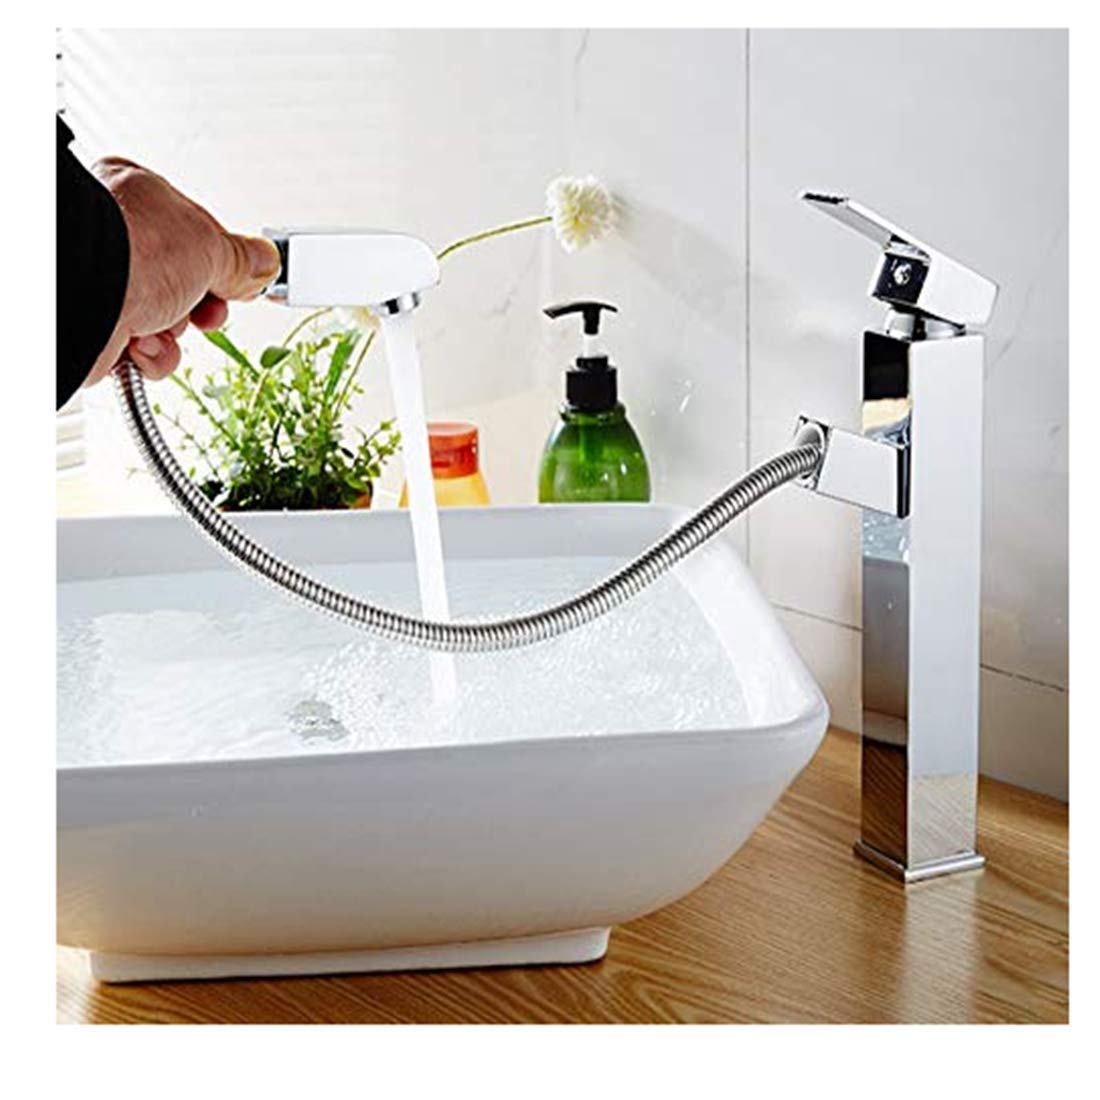 Edelstahlhahn weiße Chrombadhahnbasin Hot And Cold Copper Telescopic Bathroom Basin Bathroom Cabinet Washbasin A-1